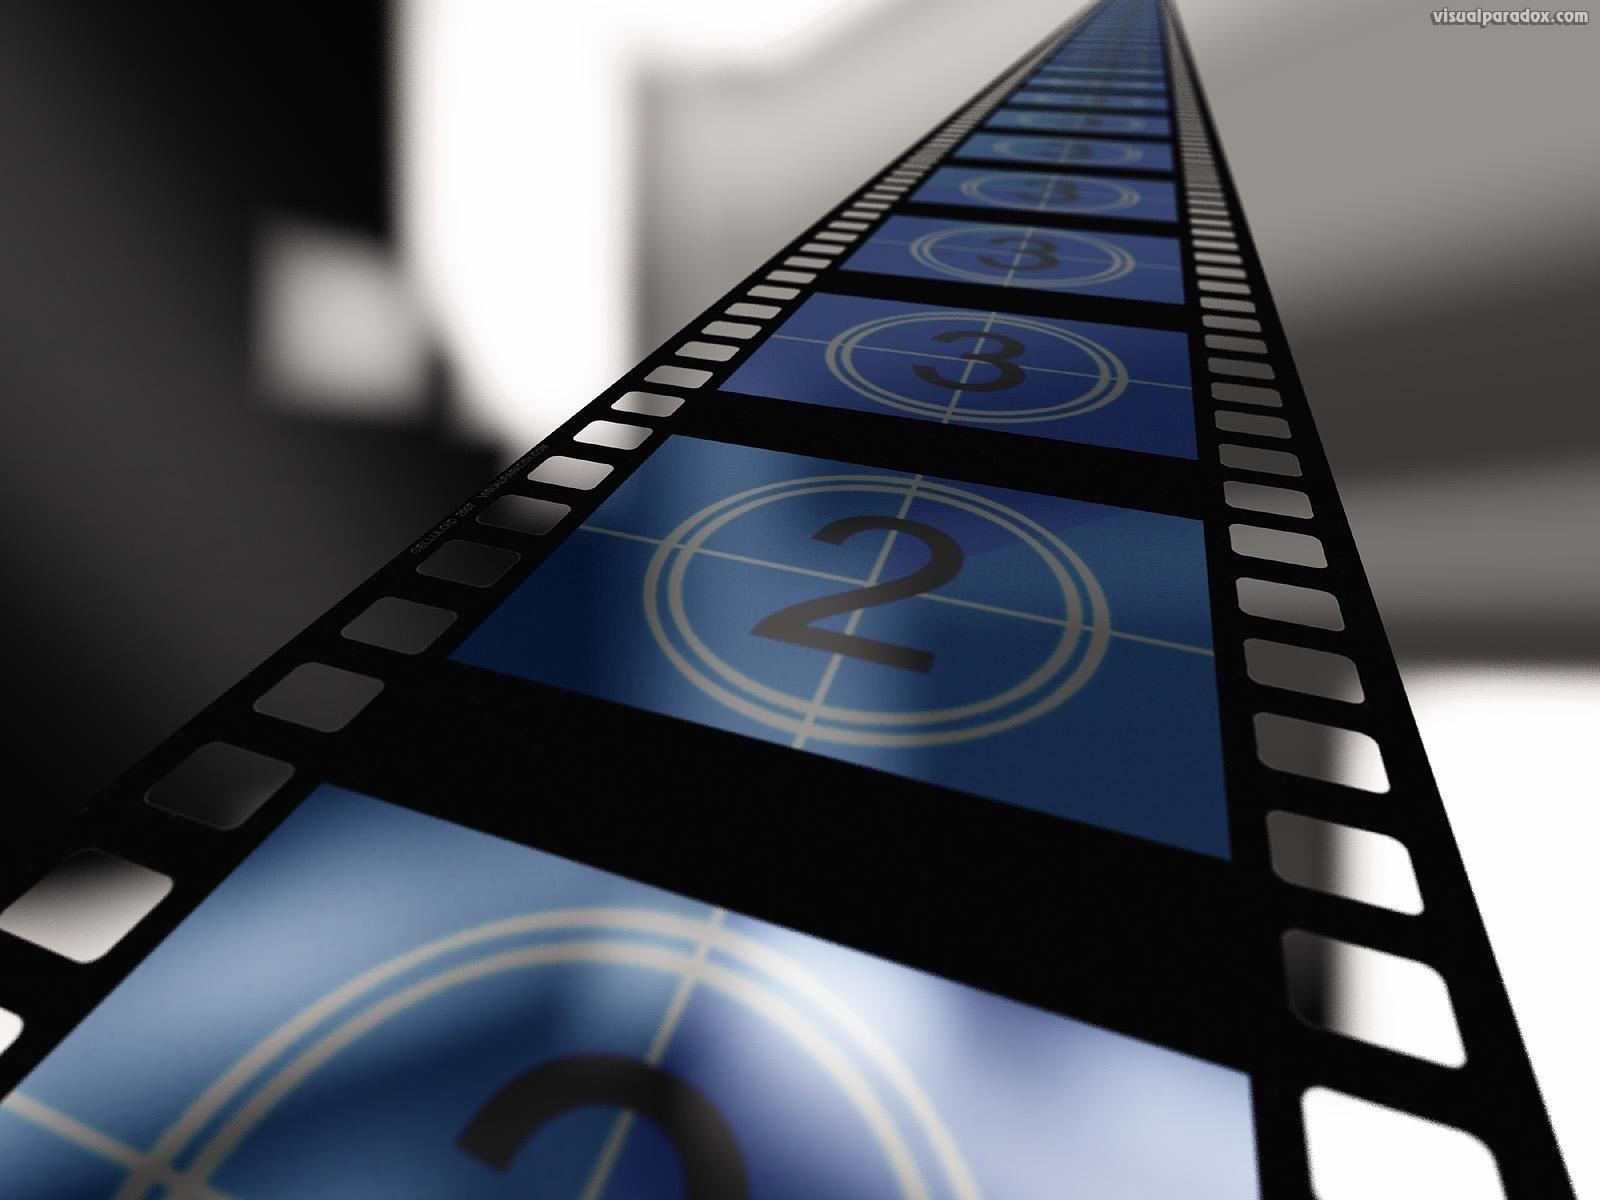 cineteca nacional en chihuahua